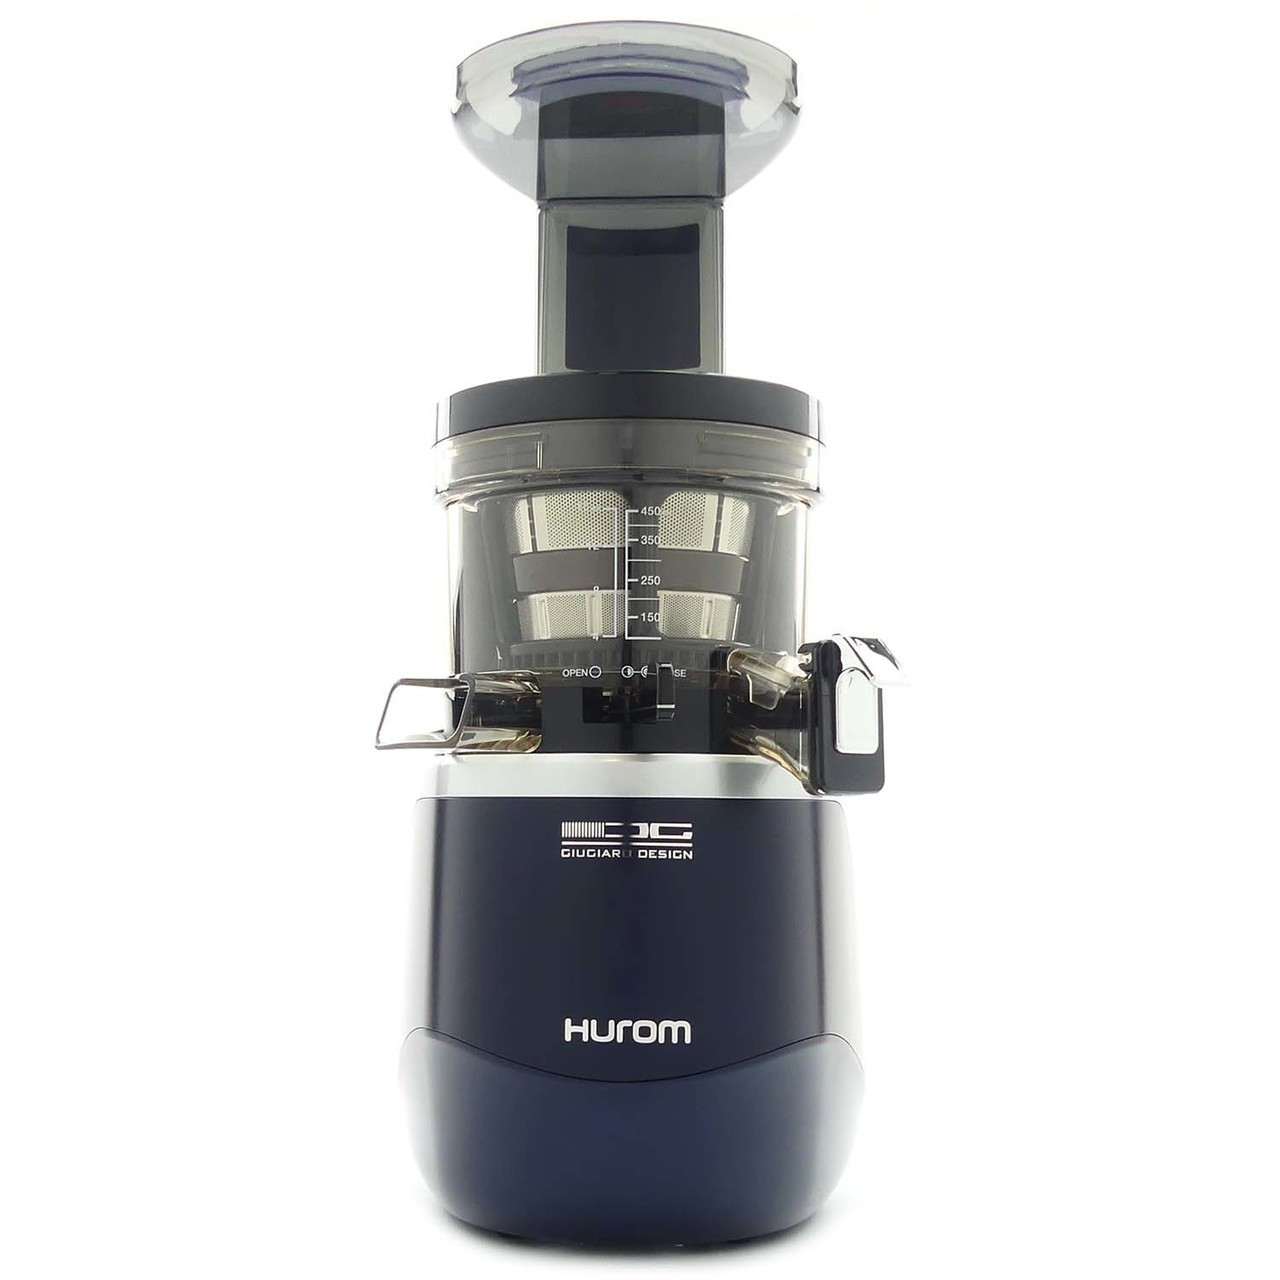 Hurom H-AE Alpha+ Slow Juicer in Navy Blue